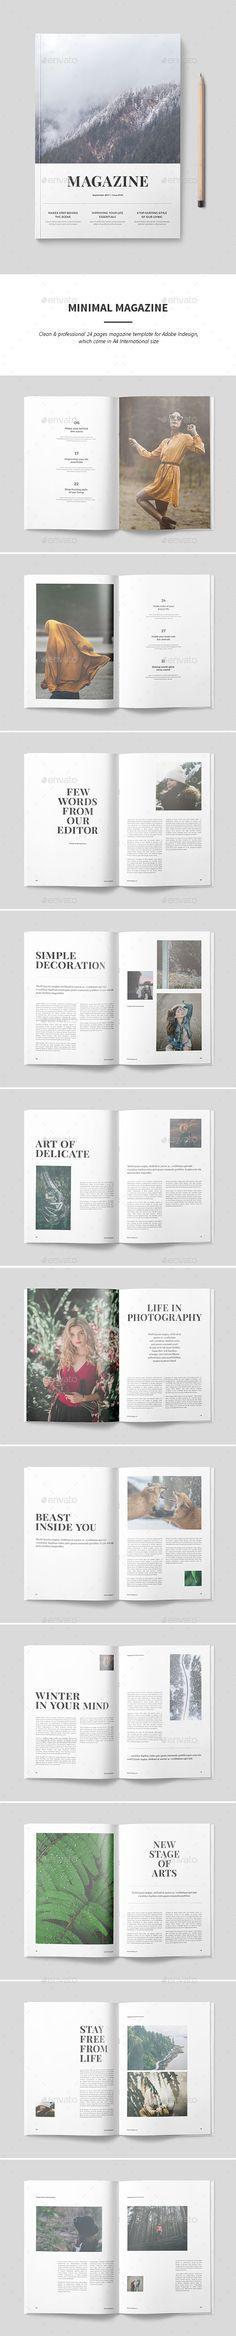 Magazine Template - Magazines Print Templates Download here: https://graphicriver.net/item/magazine-template/19922628?https://graphicriver.net/item/magazine-template/19871576? ref=classicdesignp